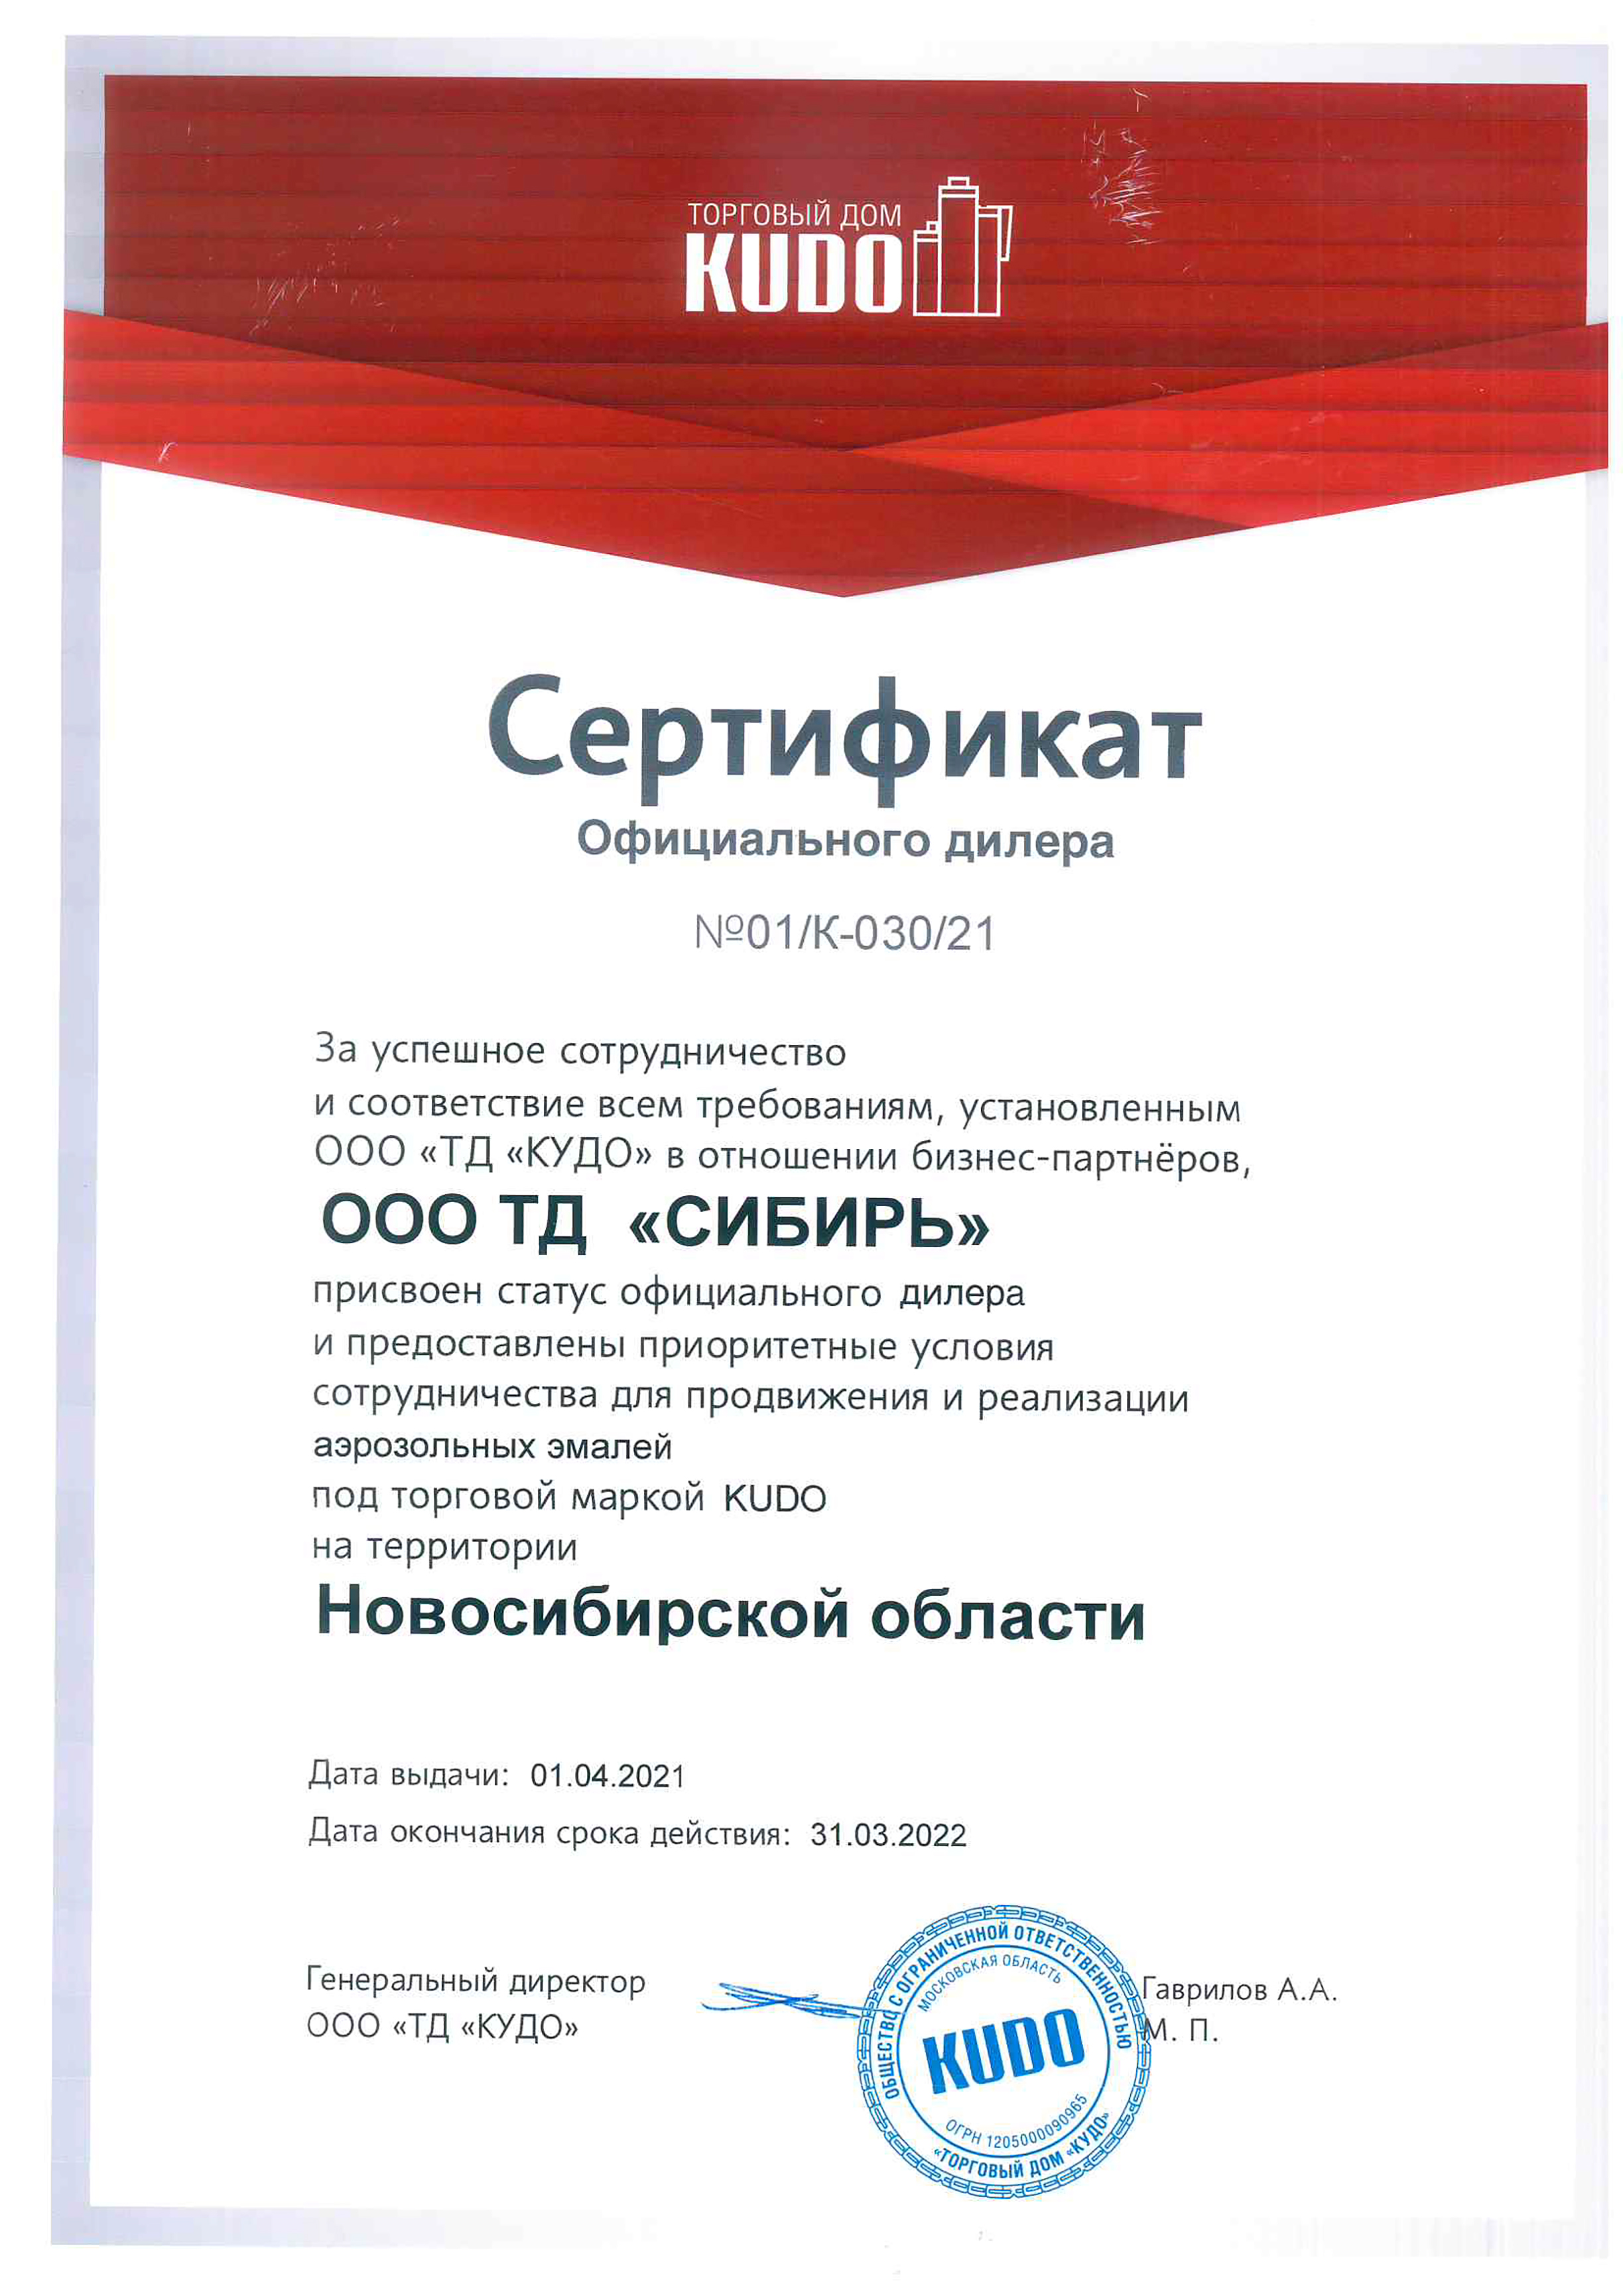 Сертификат дилера Kudo